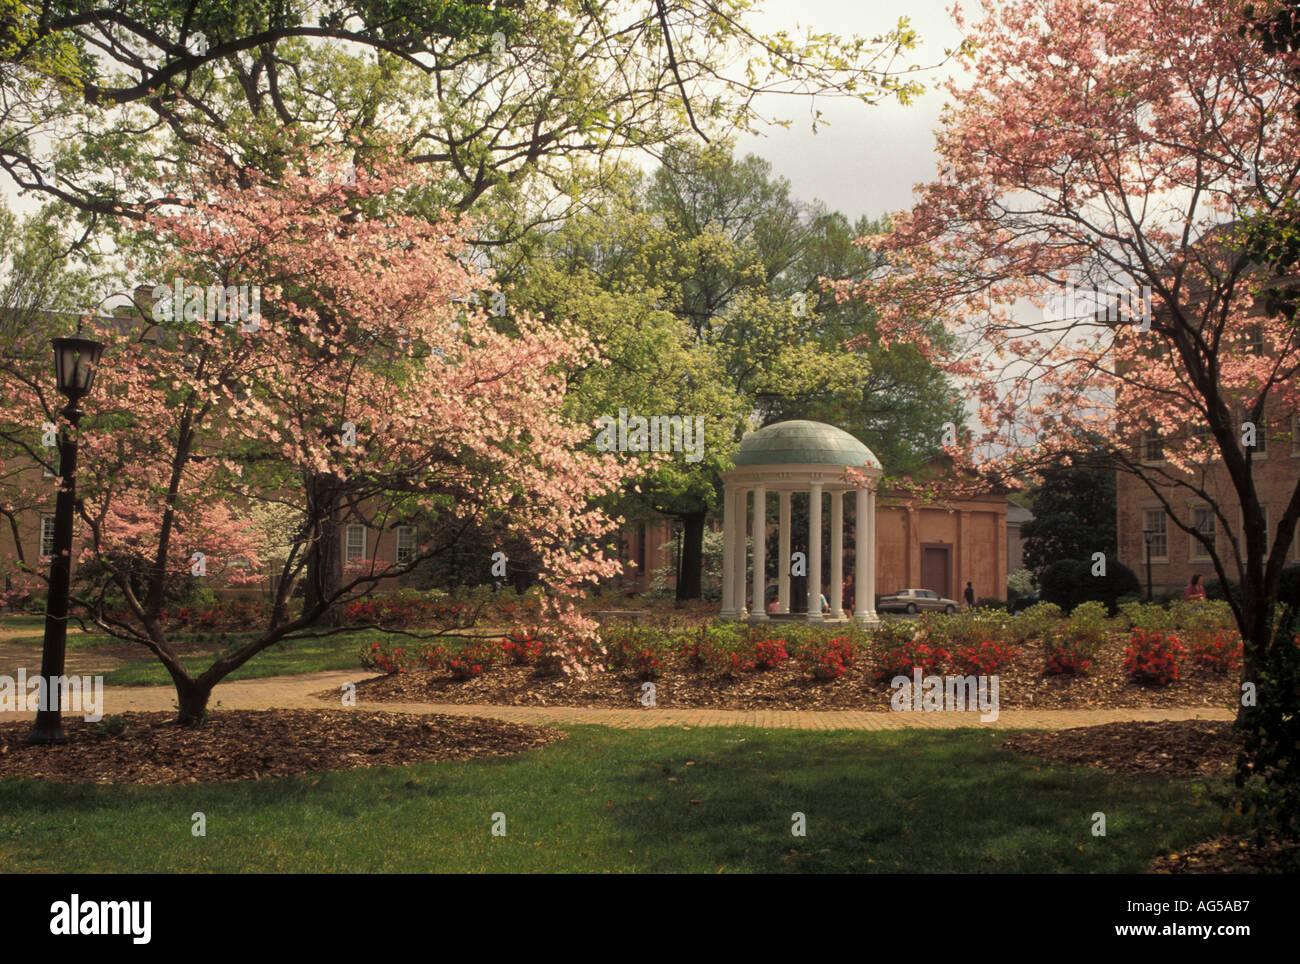 Chapel Hill Nc Stock Photos & Chapel Hill Nc Stock Images - Alamy